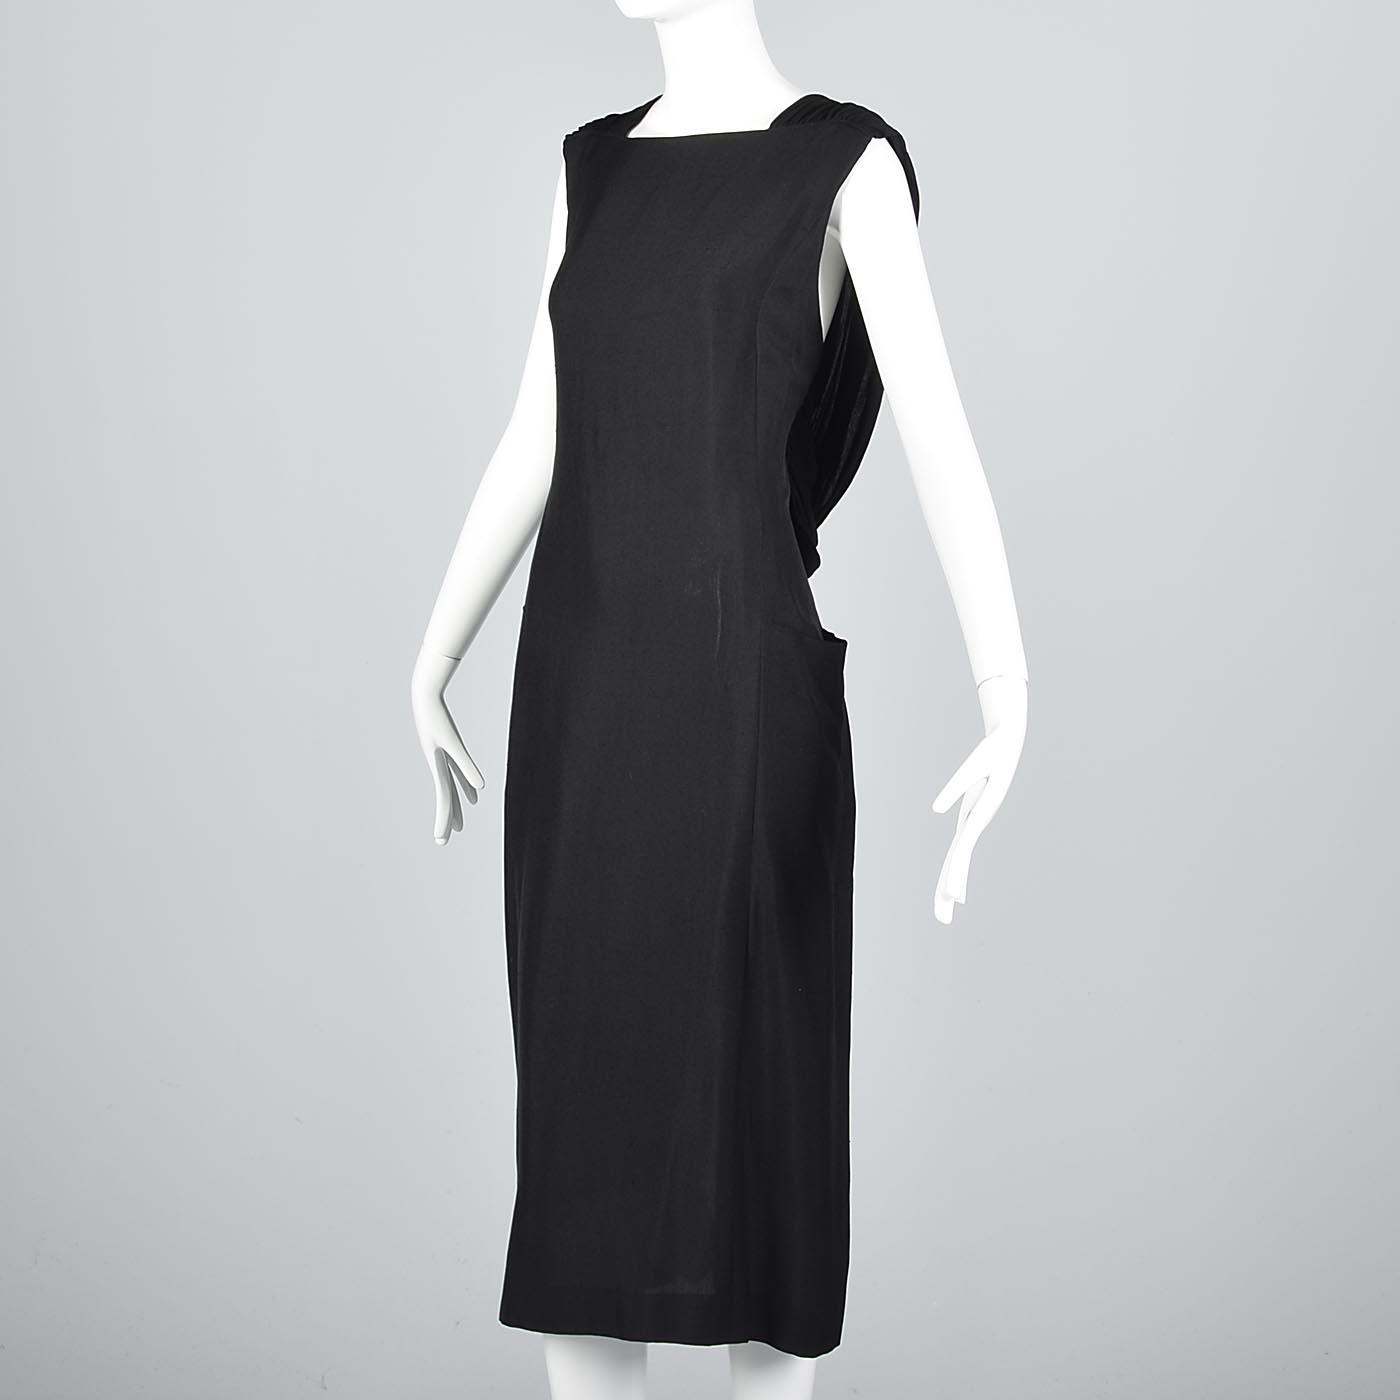 2f336a8cd2c M Chloe Loose Black Linen Simple Summer Dress Sleeveless Shift Vintage 1960s